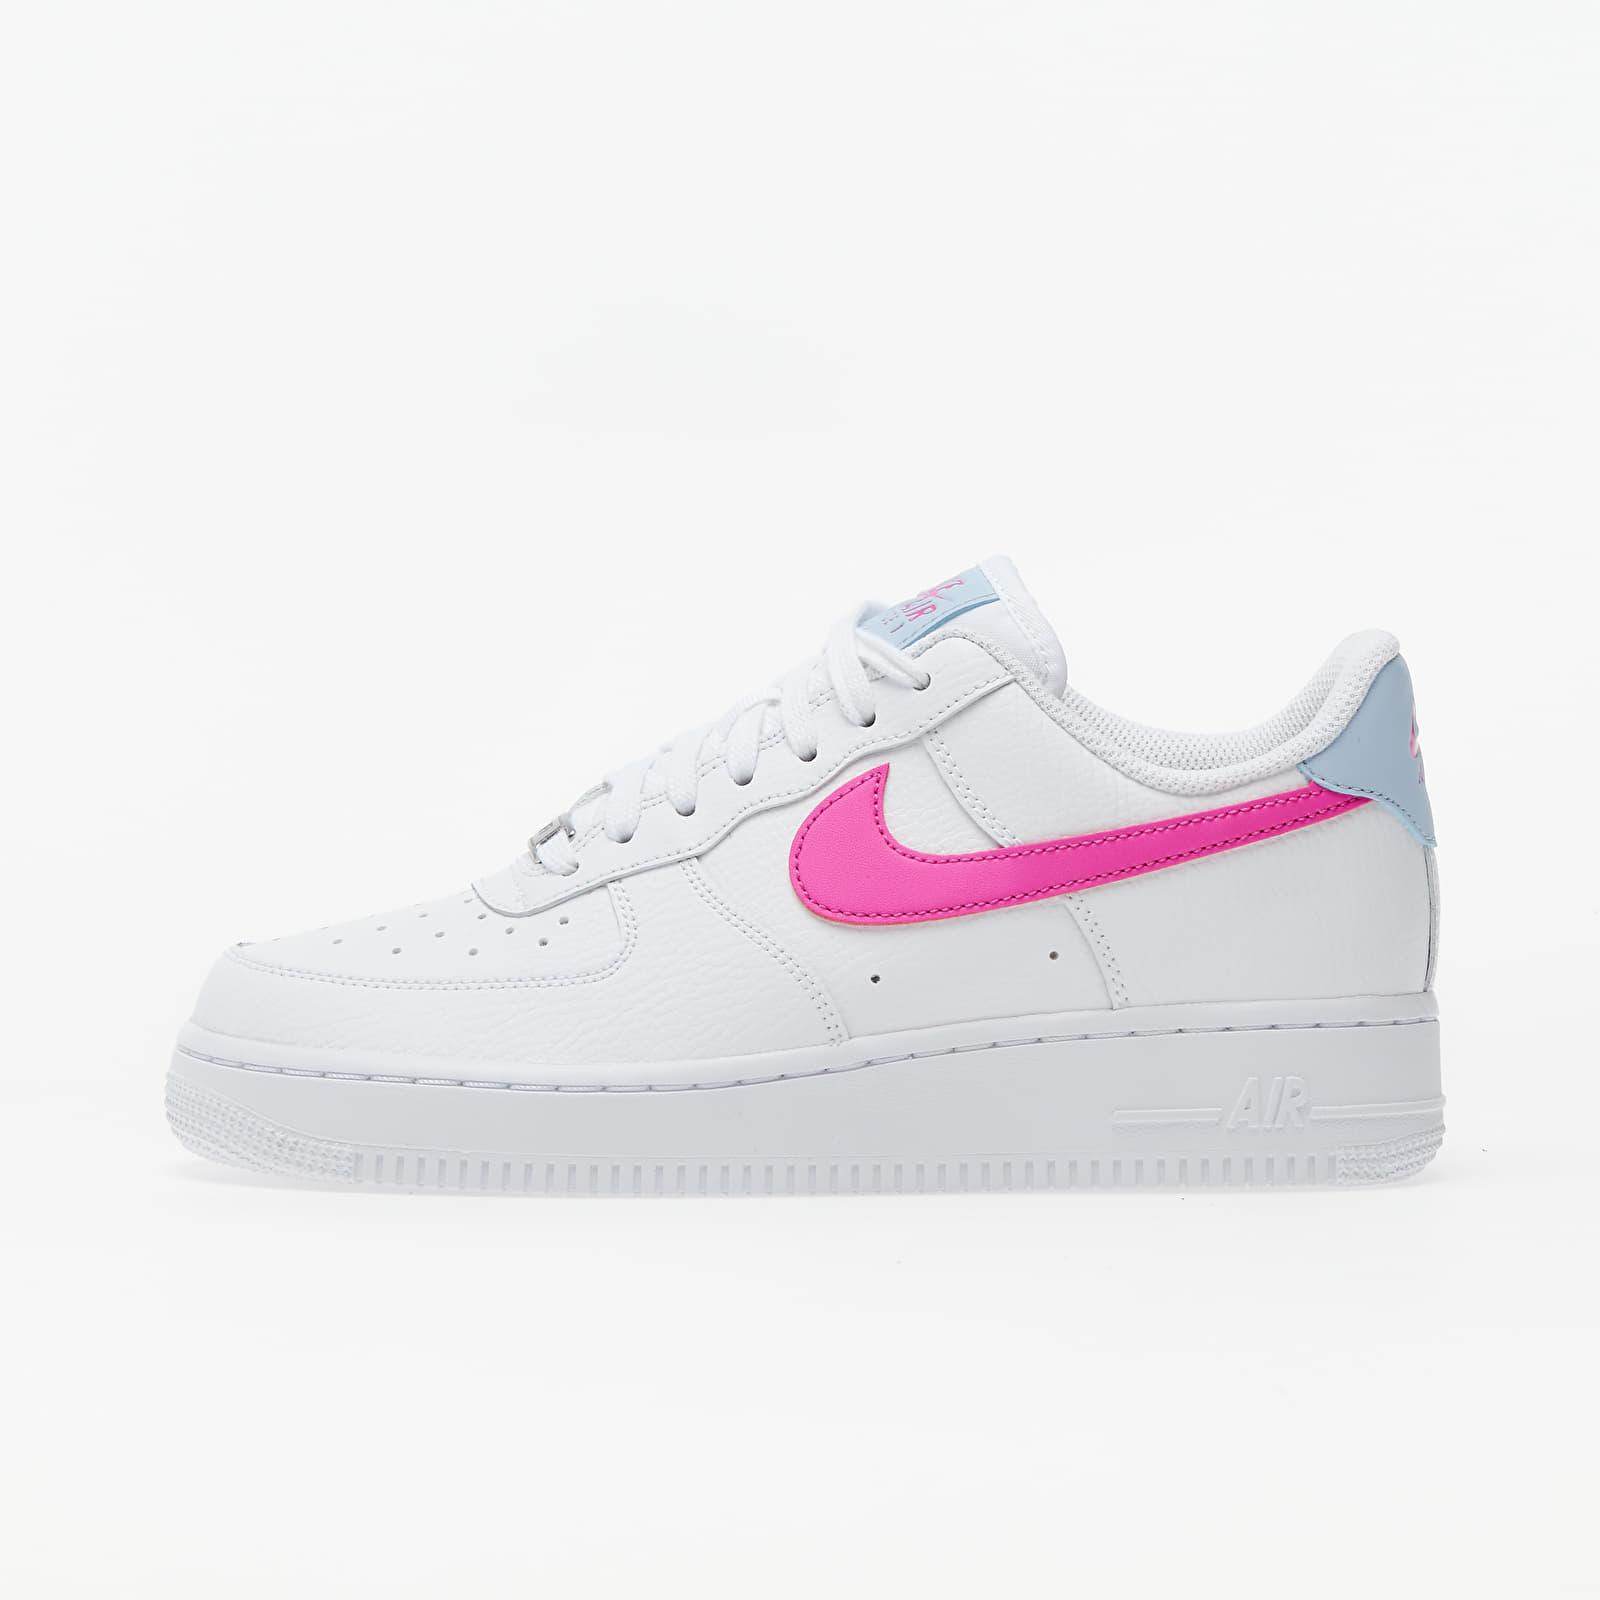 Dámské tenisky a boty Nike Wmns Air Force 1 '07 White/ Fire Pink-Hydrogen Blue